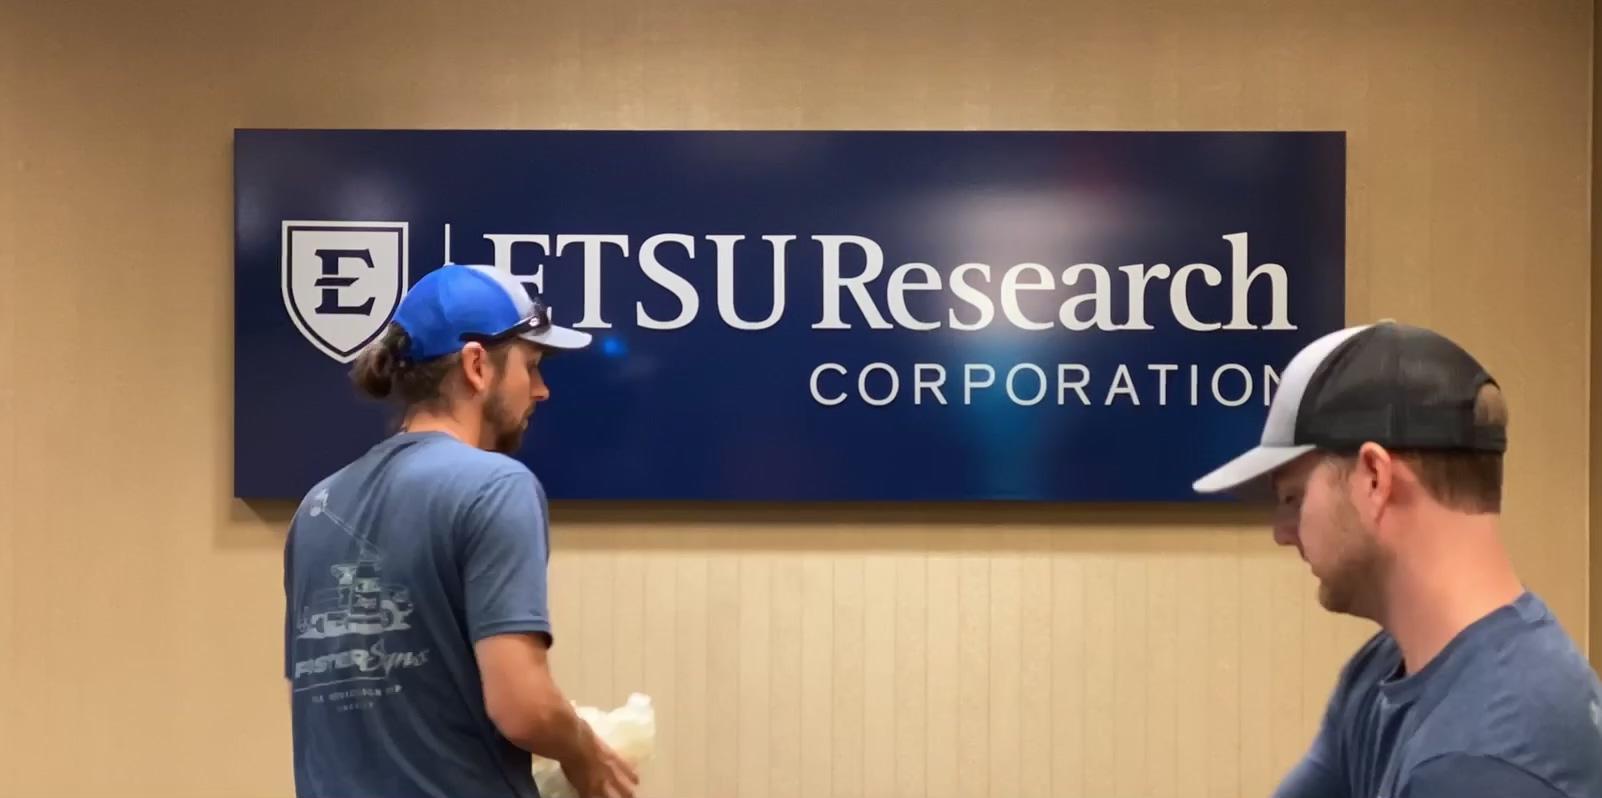 ETSU RC Sign Install Timelapse